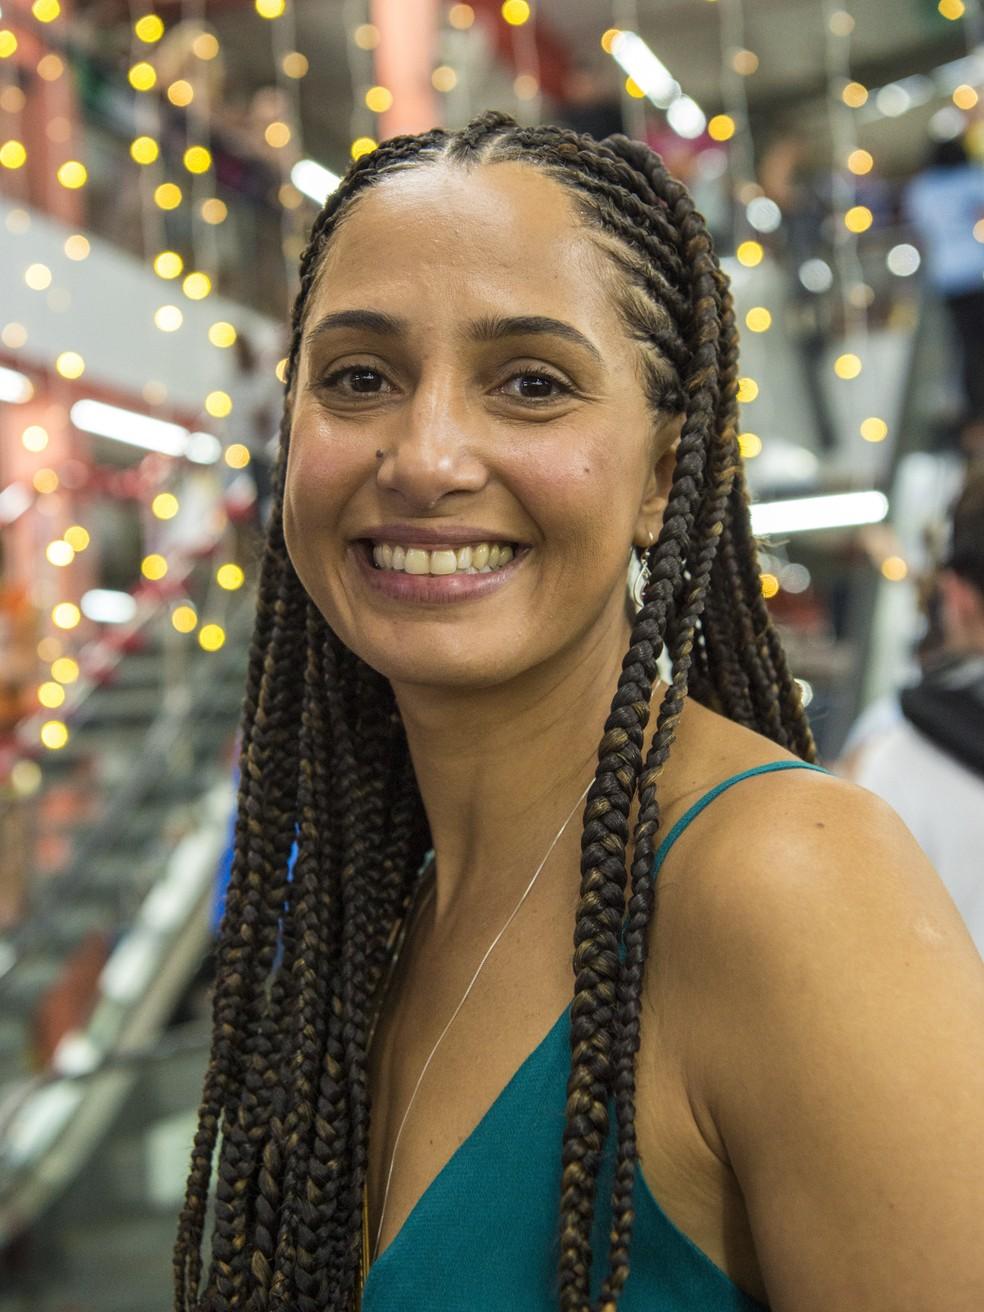 Camila Pitanga dating historia raket ligan matchmaking